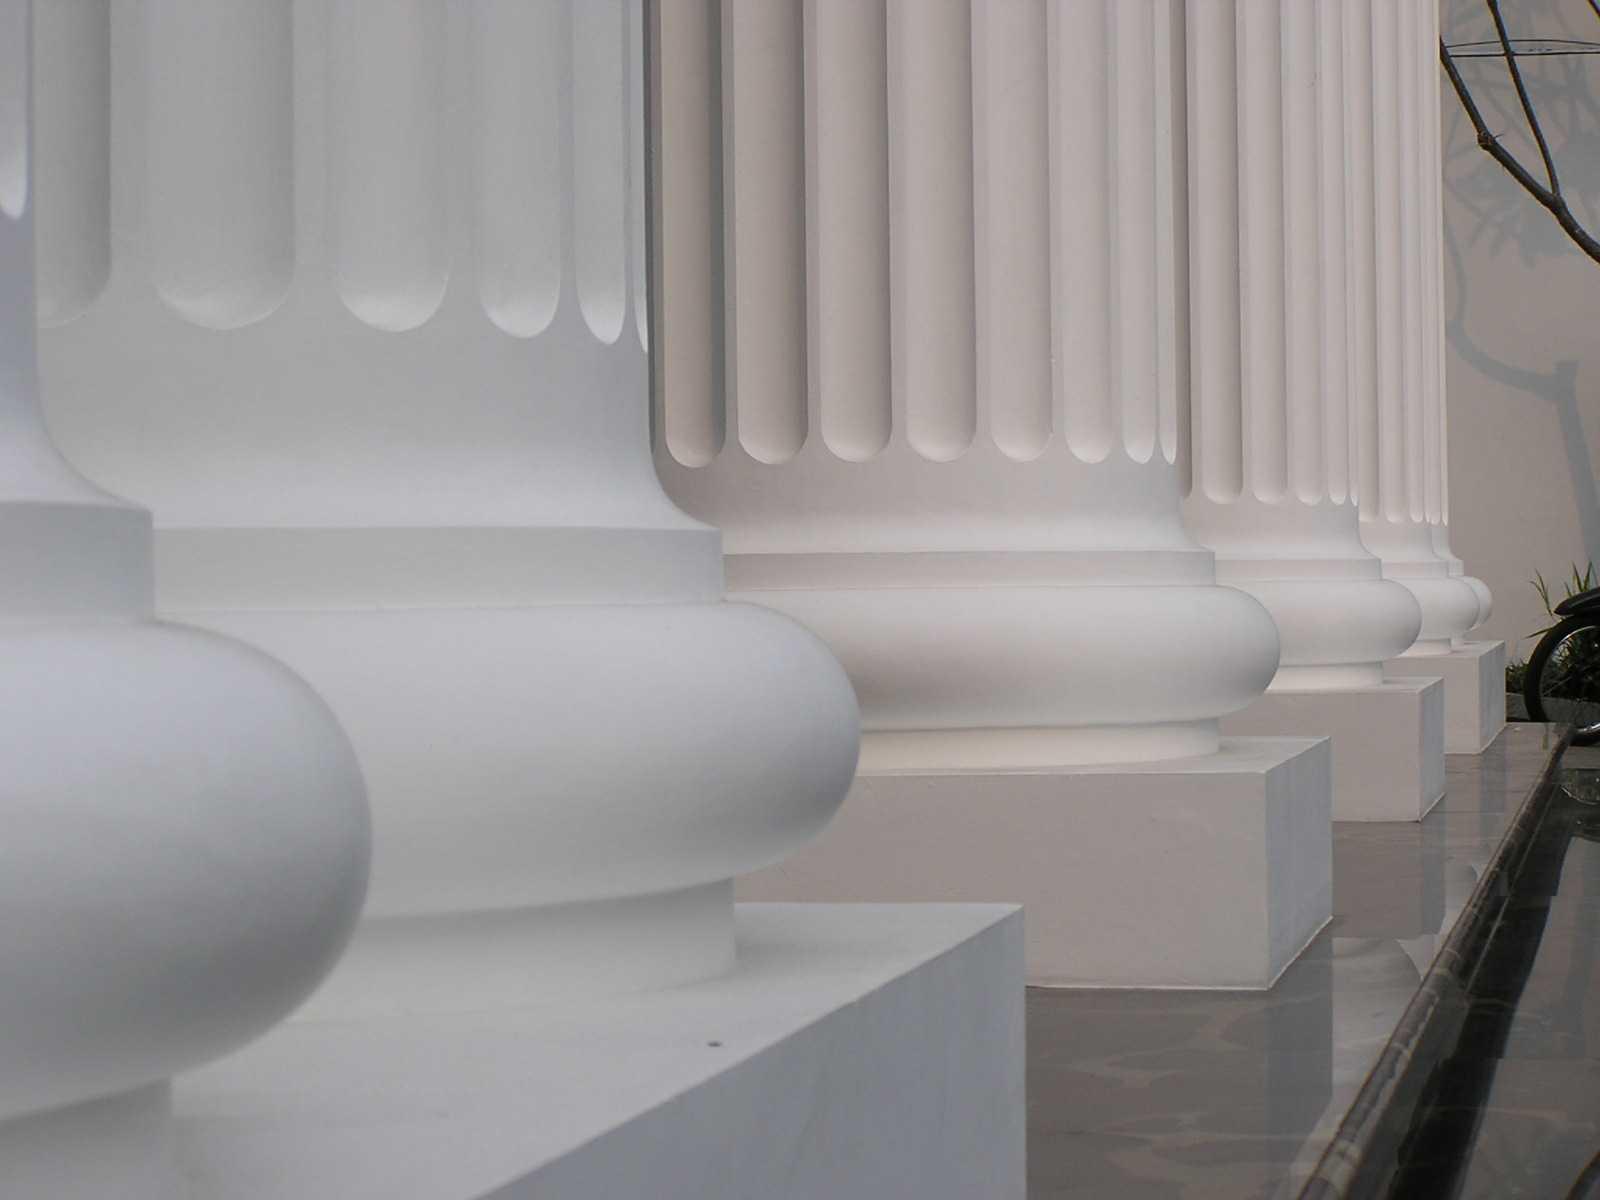 Pt. Garisprada Pattimura Residence Jl. Pattimura, Selong, Kby. Baru, Kota Jakarta Selatan, Daerah Khusus Ibukota Jakarta 12110, Indonesia Pattimura Exterior Detail-Pillar Modern  22091